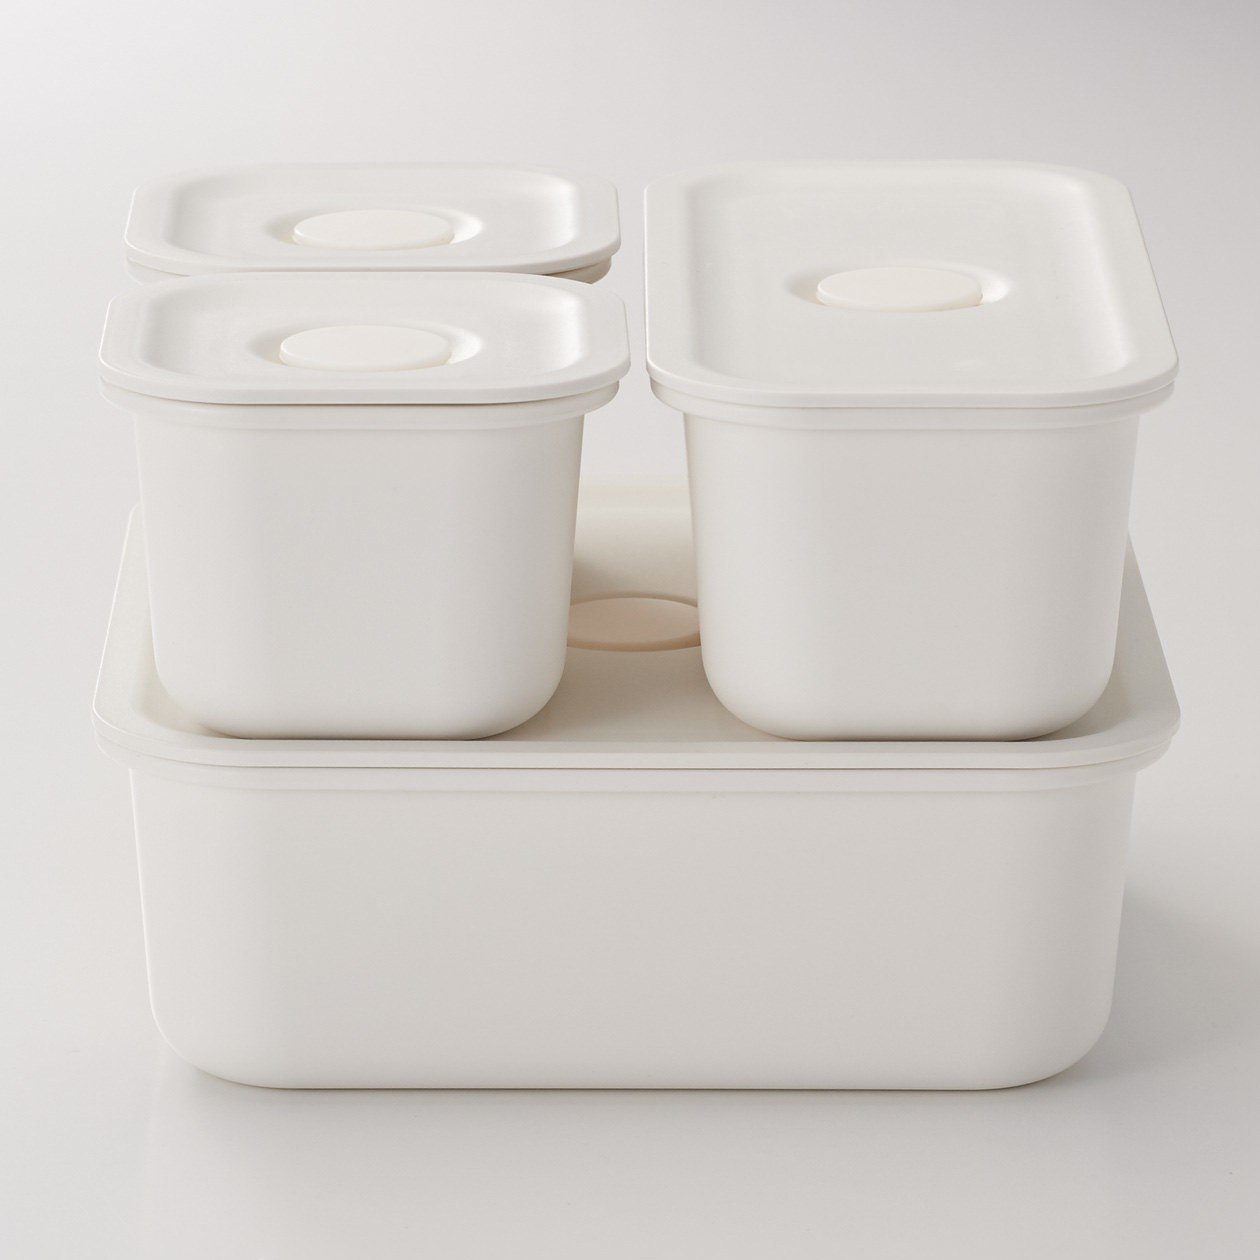 MUJI無印良品聚丙烯密閉式便當盒系列,新售價降幅約20%左右。圖/無印良品提供